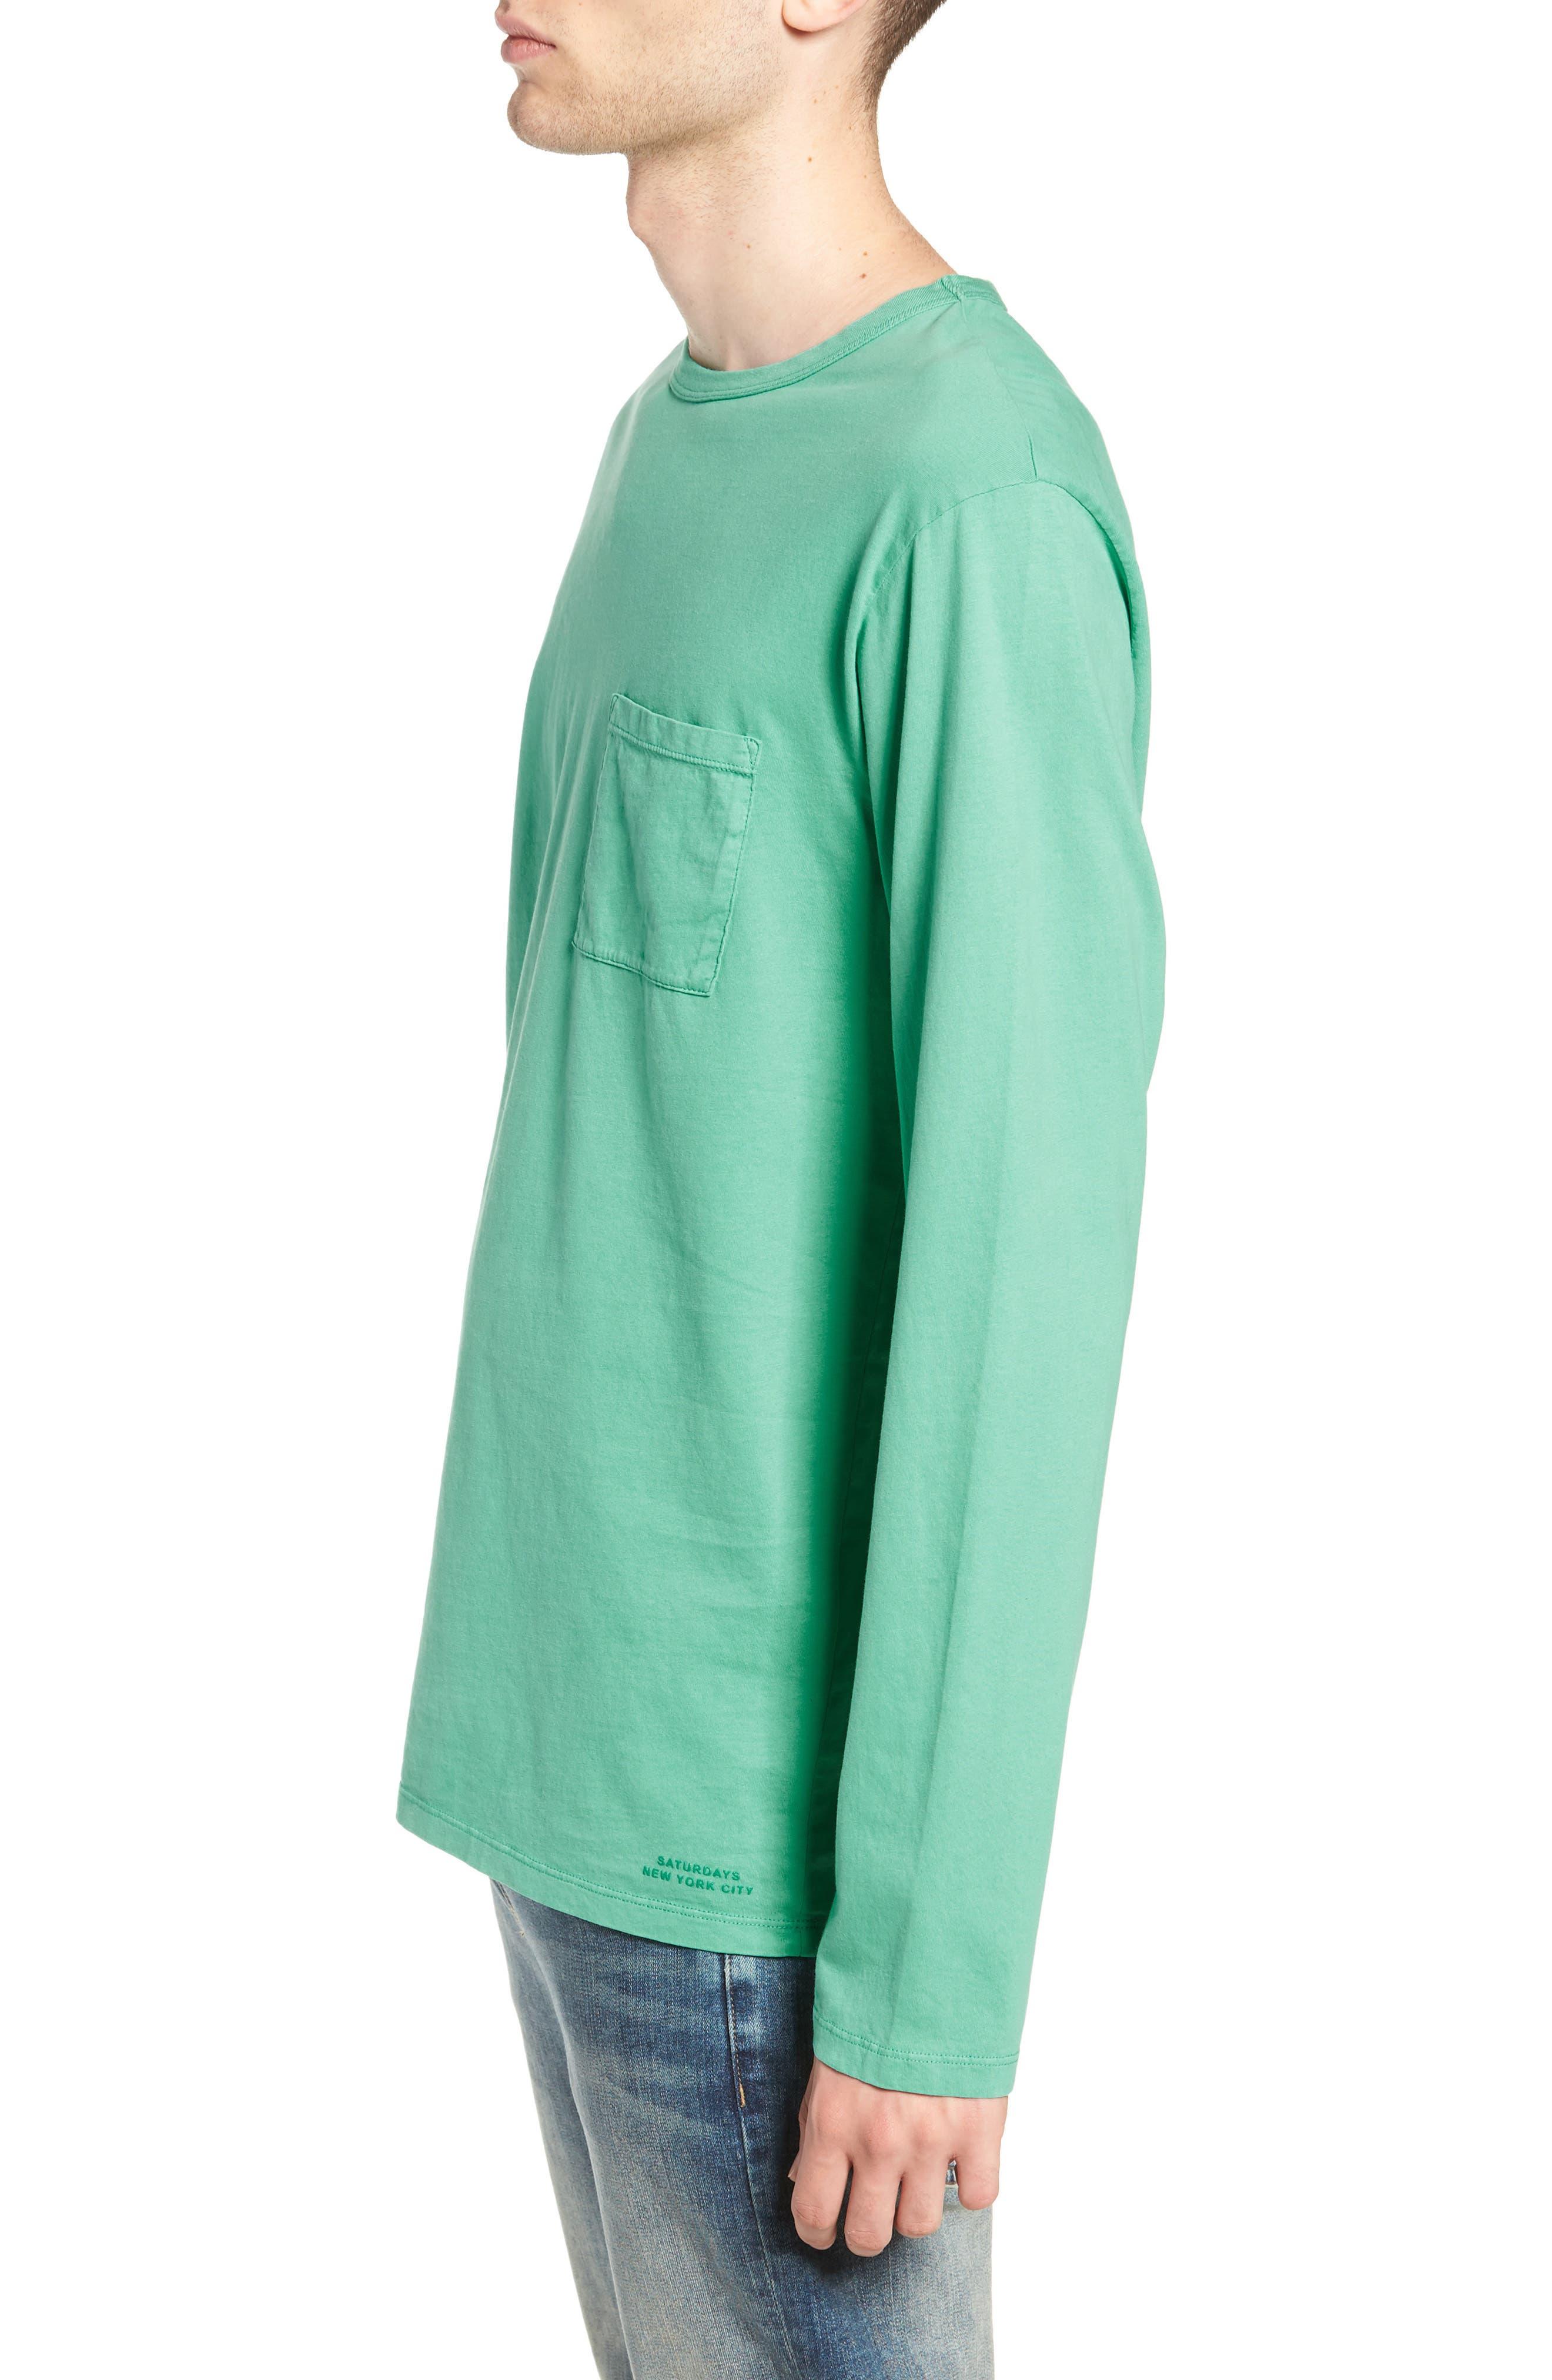 James Pima Long Sleeve Pocket T-Shirt,                             Alternate thumbnail 3, color,                             SEAFOAM GREEN